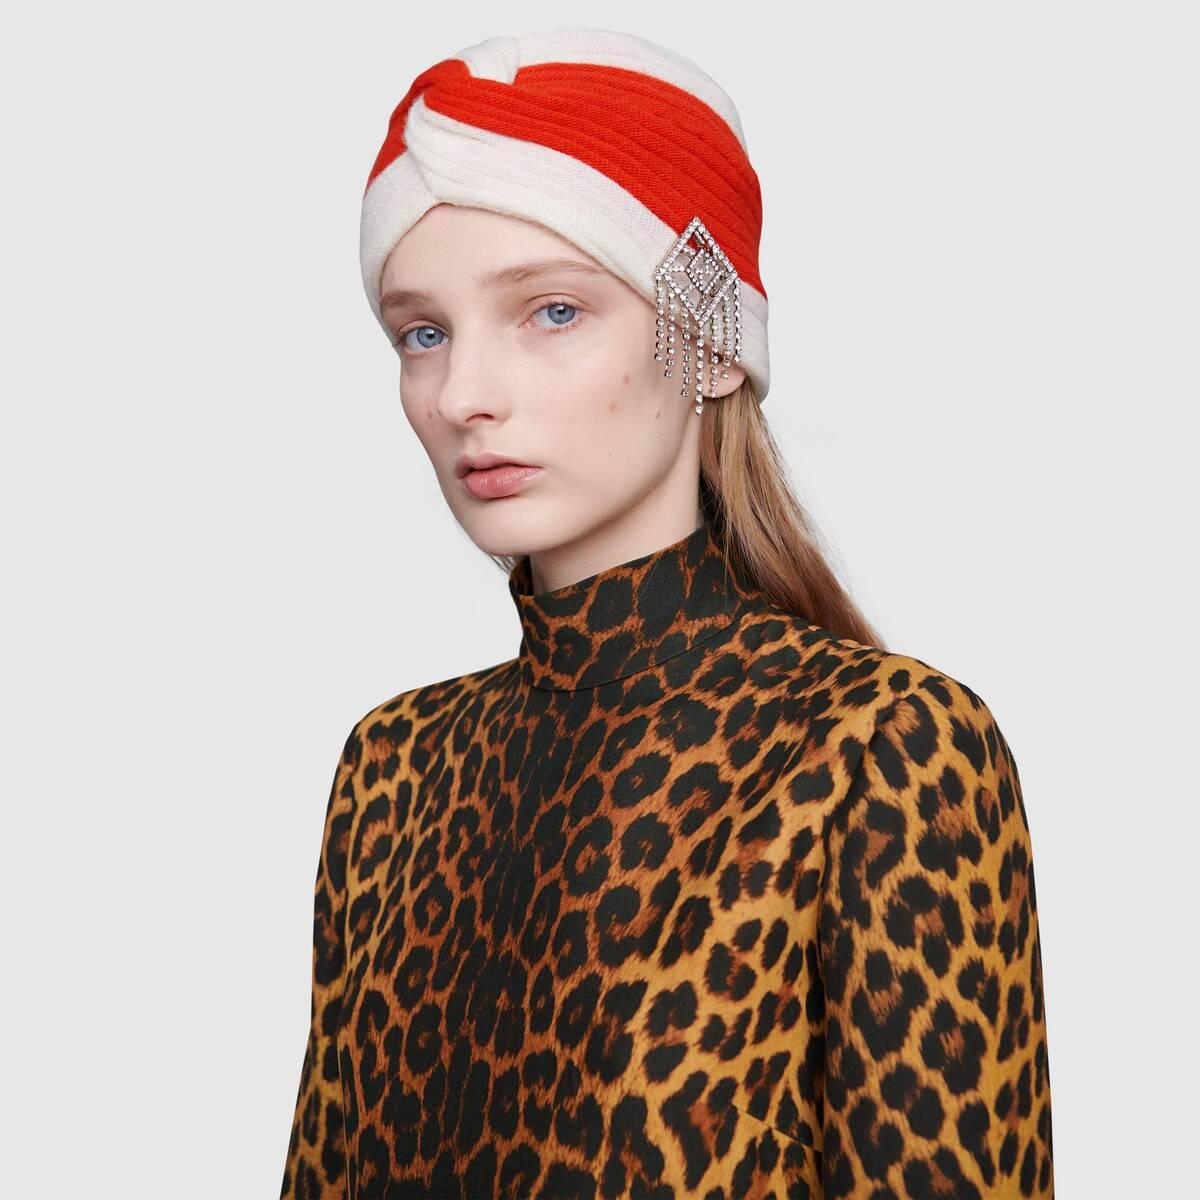 562491_3G206_9274_008_100_0000_Light-Wool-headband-with-crystal-Art-DecoGG.jpg